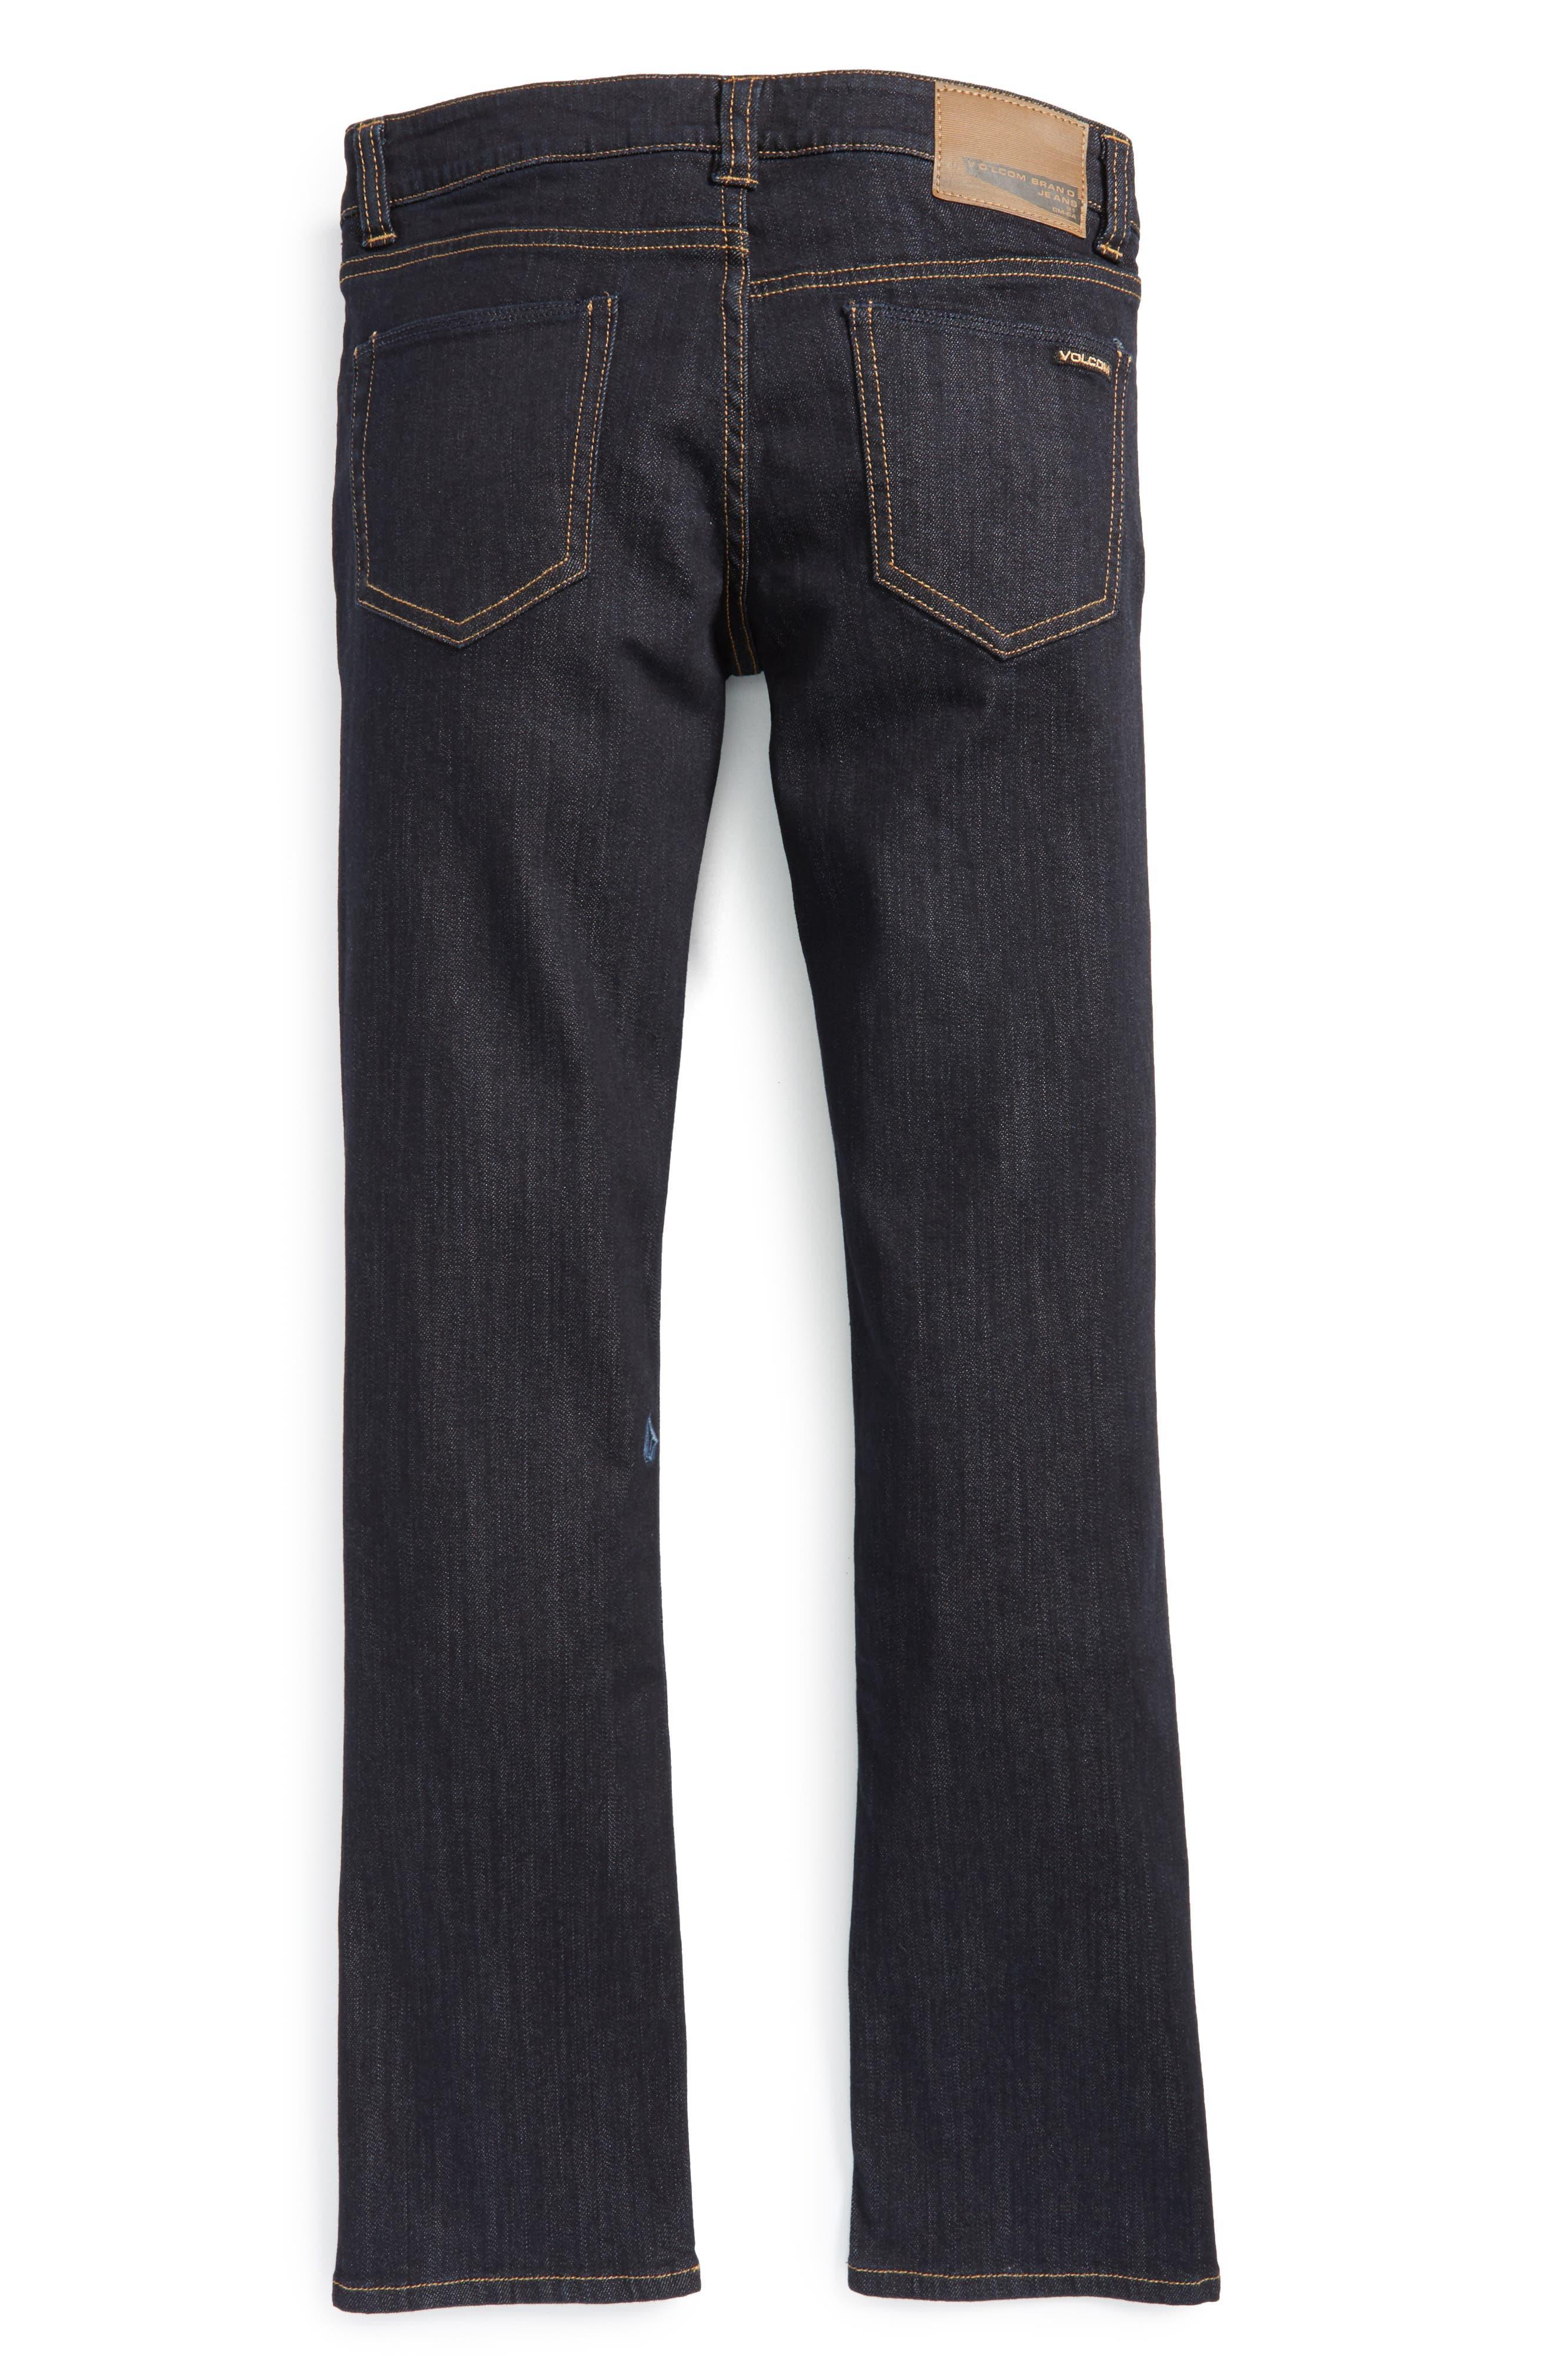 Vorta Slim Fit Jeans,                             Alternate thumbnail 4, color,                             BLUE RINSER